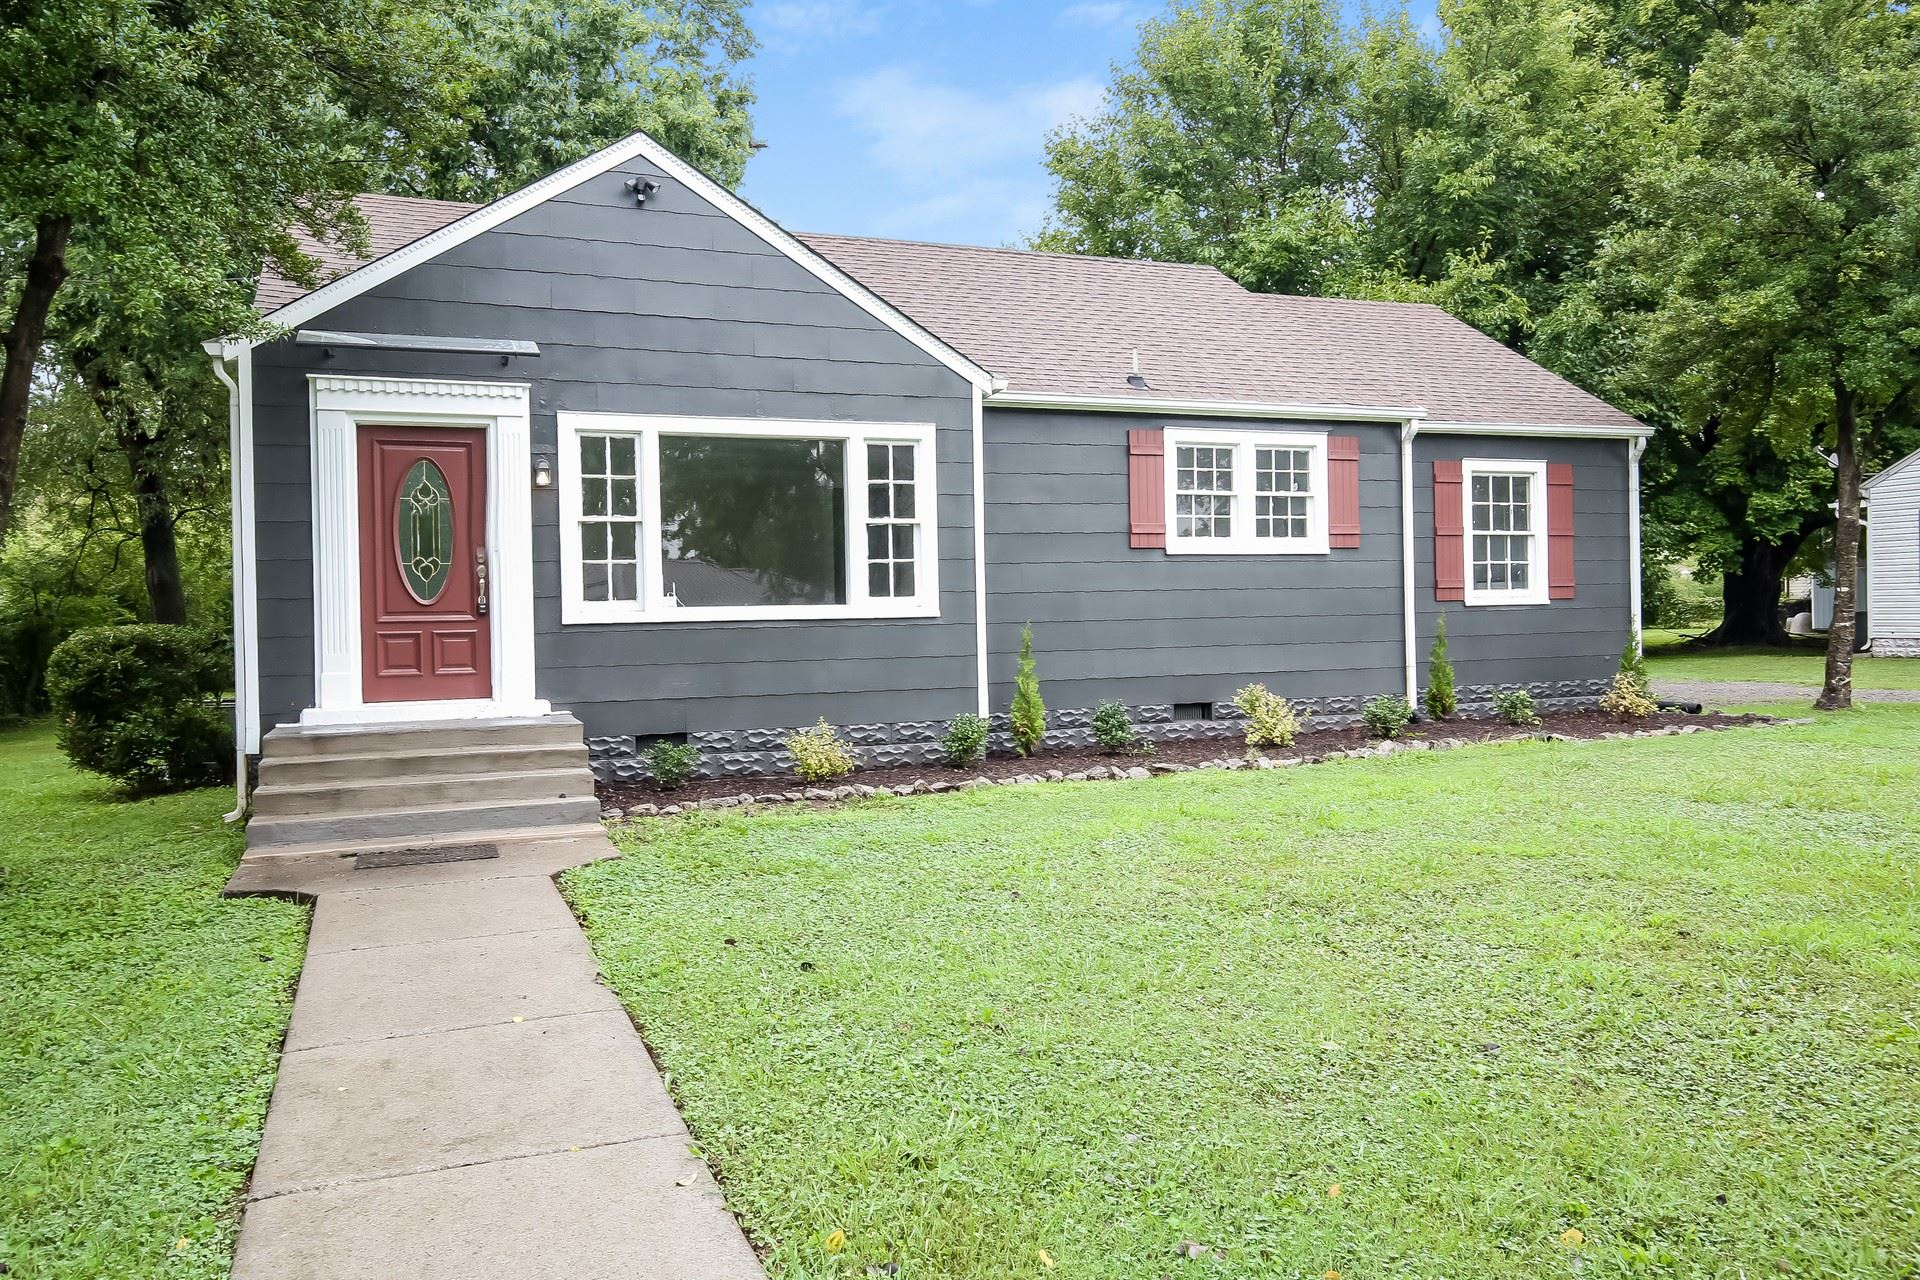 Photo of 1519 Hilldale Dr, Murfreesboro, TN 37129 (MLS # 2288080)